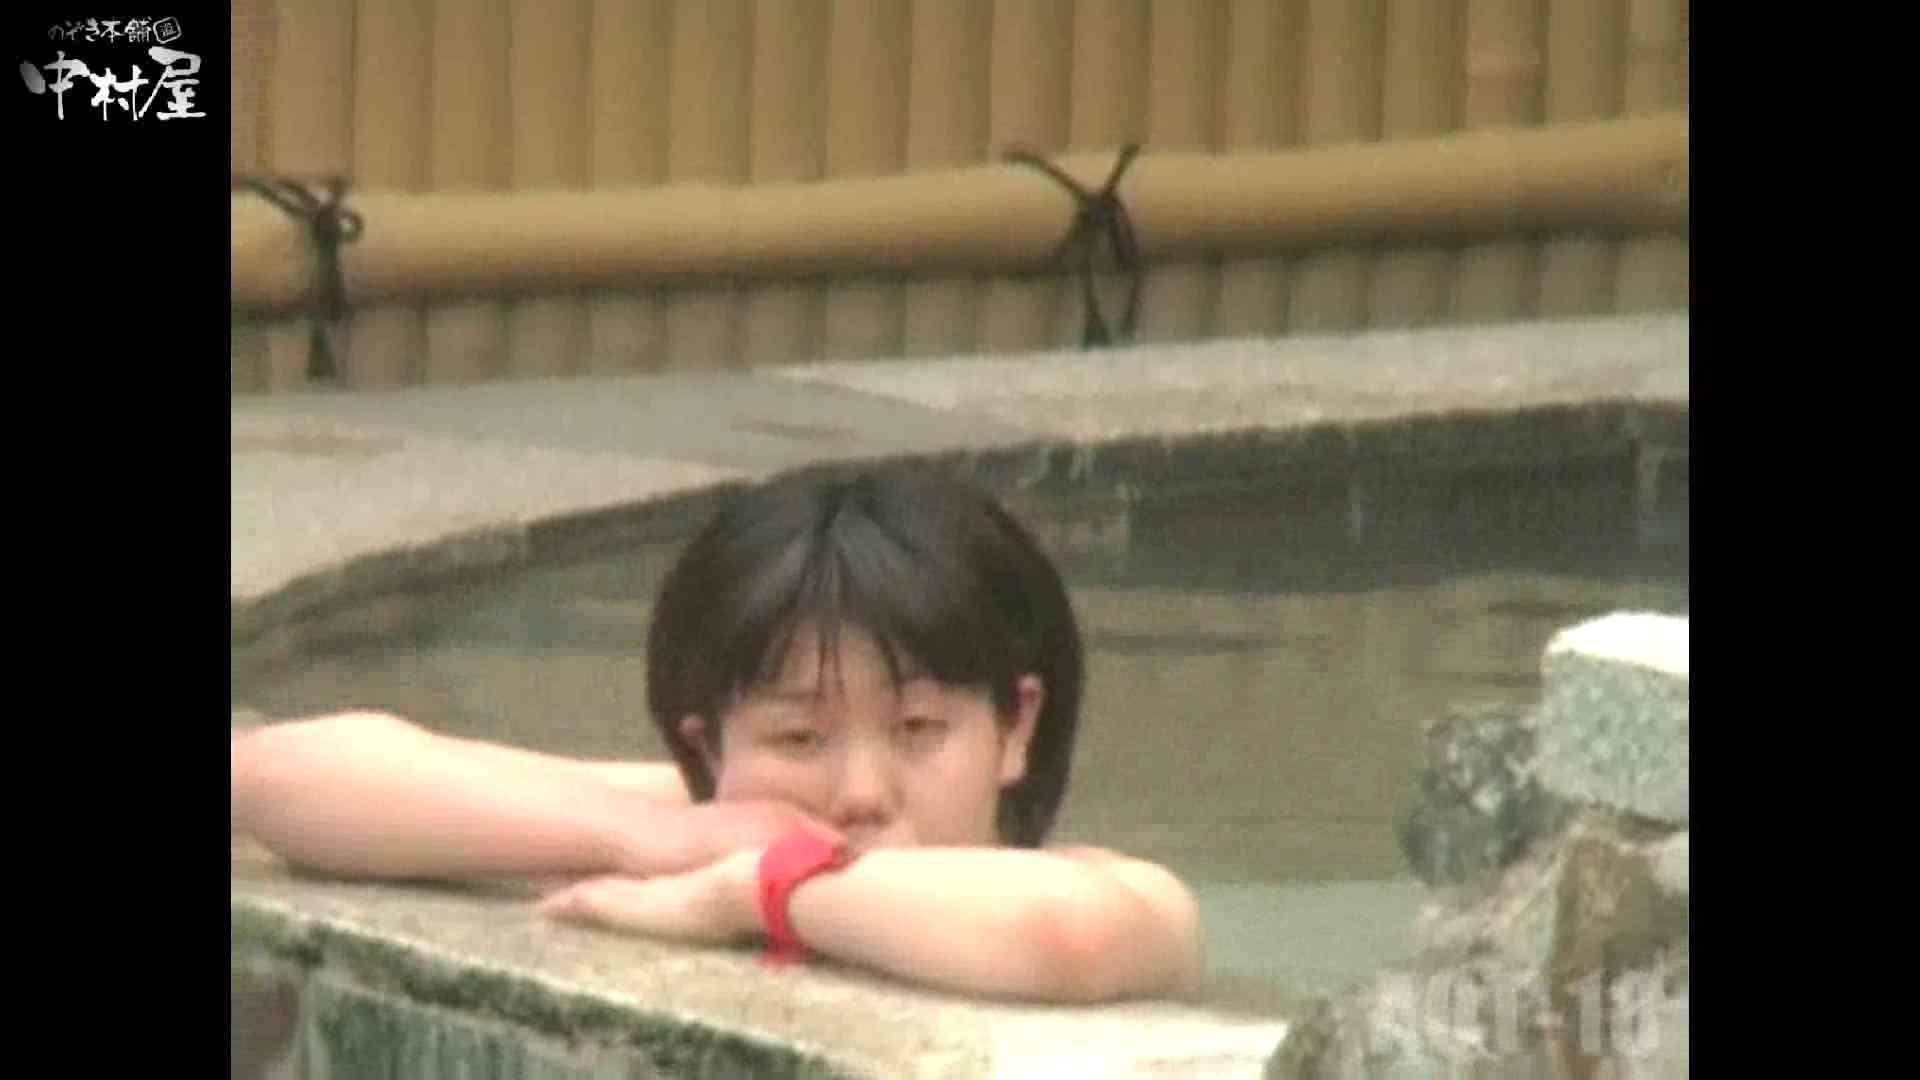 Aquaな露天風呂Vol.882潜入盗撮露天風呂十八判湯 其の七 露天 すけべAV動画紹介 84画像 43